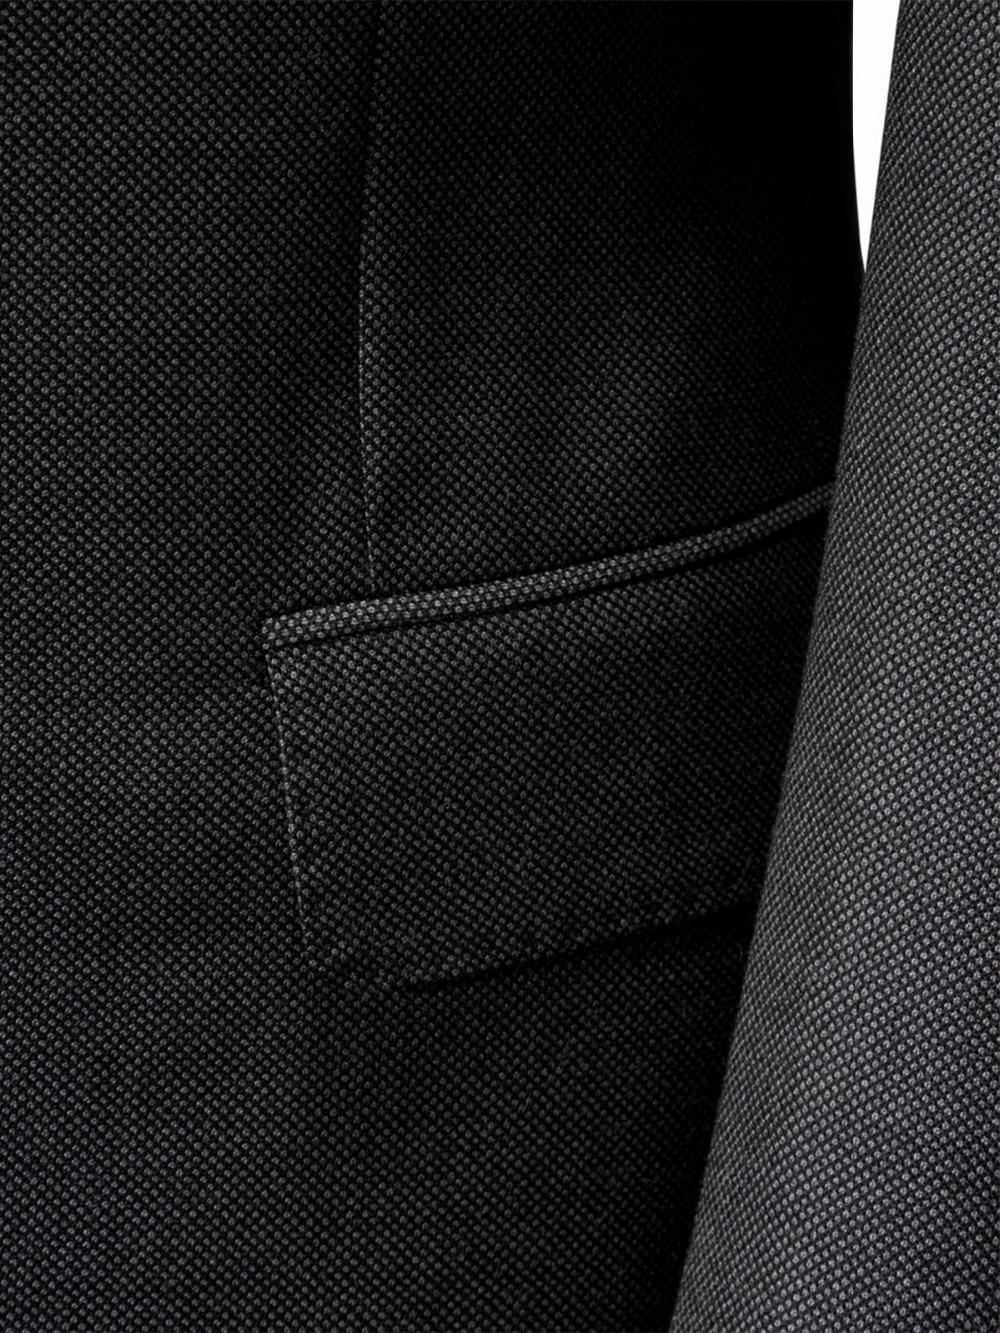 2019 Dark สีเทา Nailhead ชุดสมัยใหม่ Essential สำหรับปีสวมใส่รอบ Custom Made Slim Fit ชุดธุรกิจชุด Bestseller-ใน สูท จาก เสื้อผ้าผู้ชาย บน   2